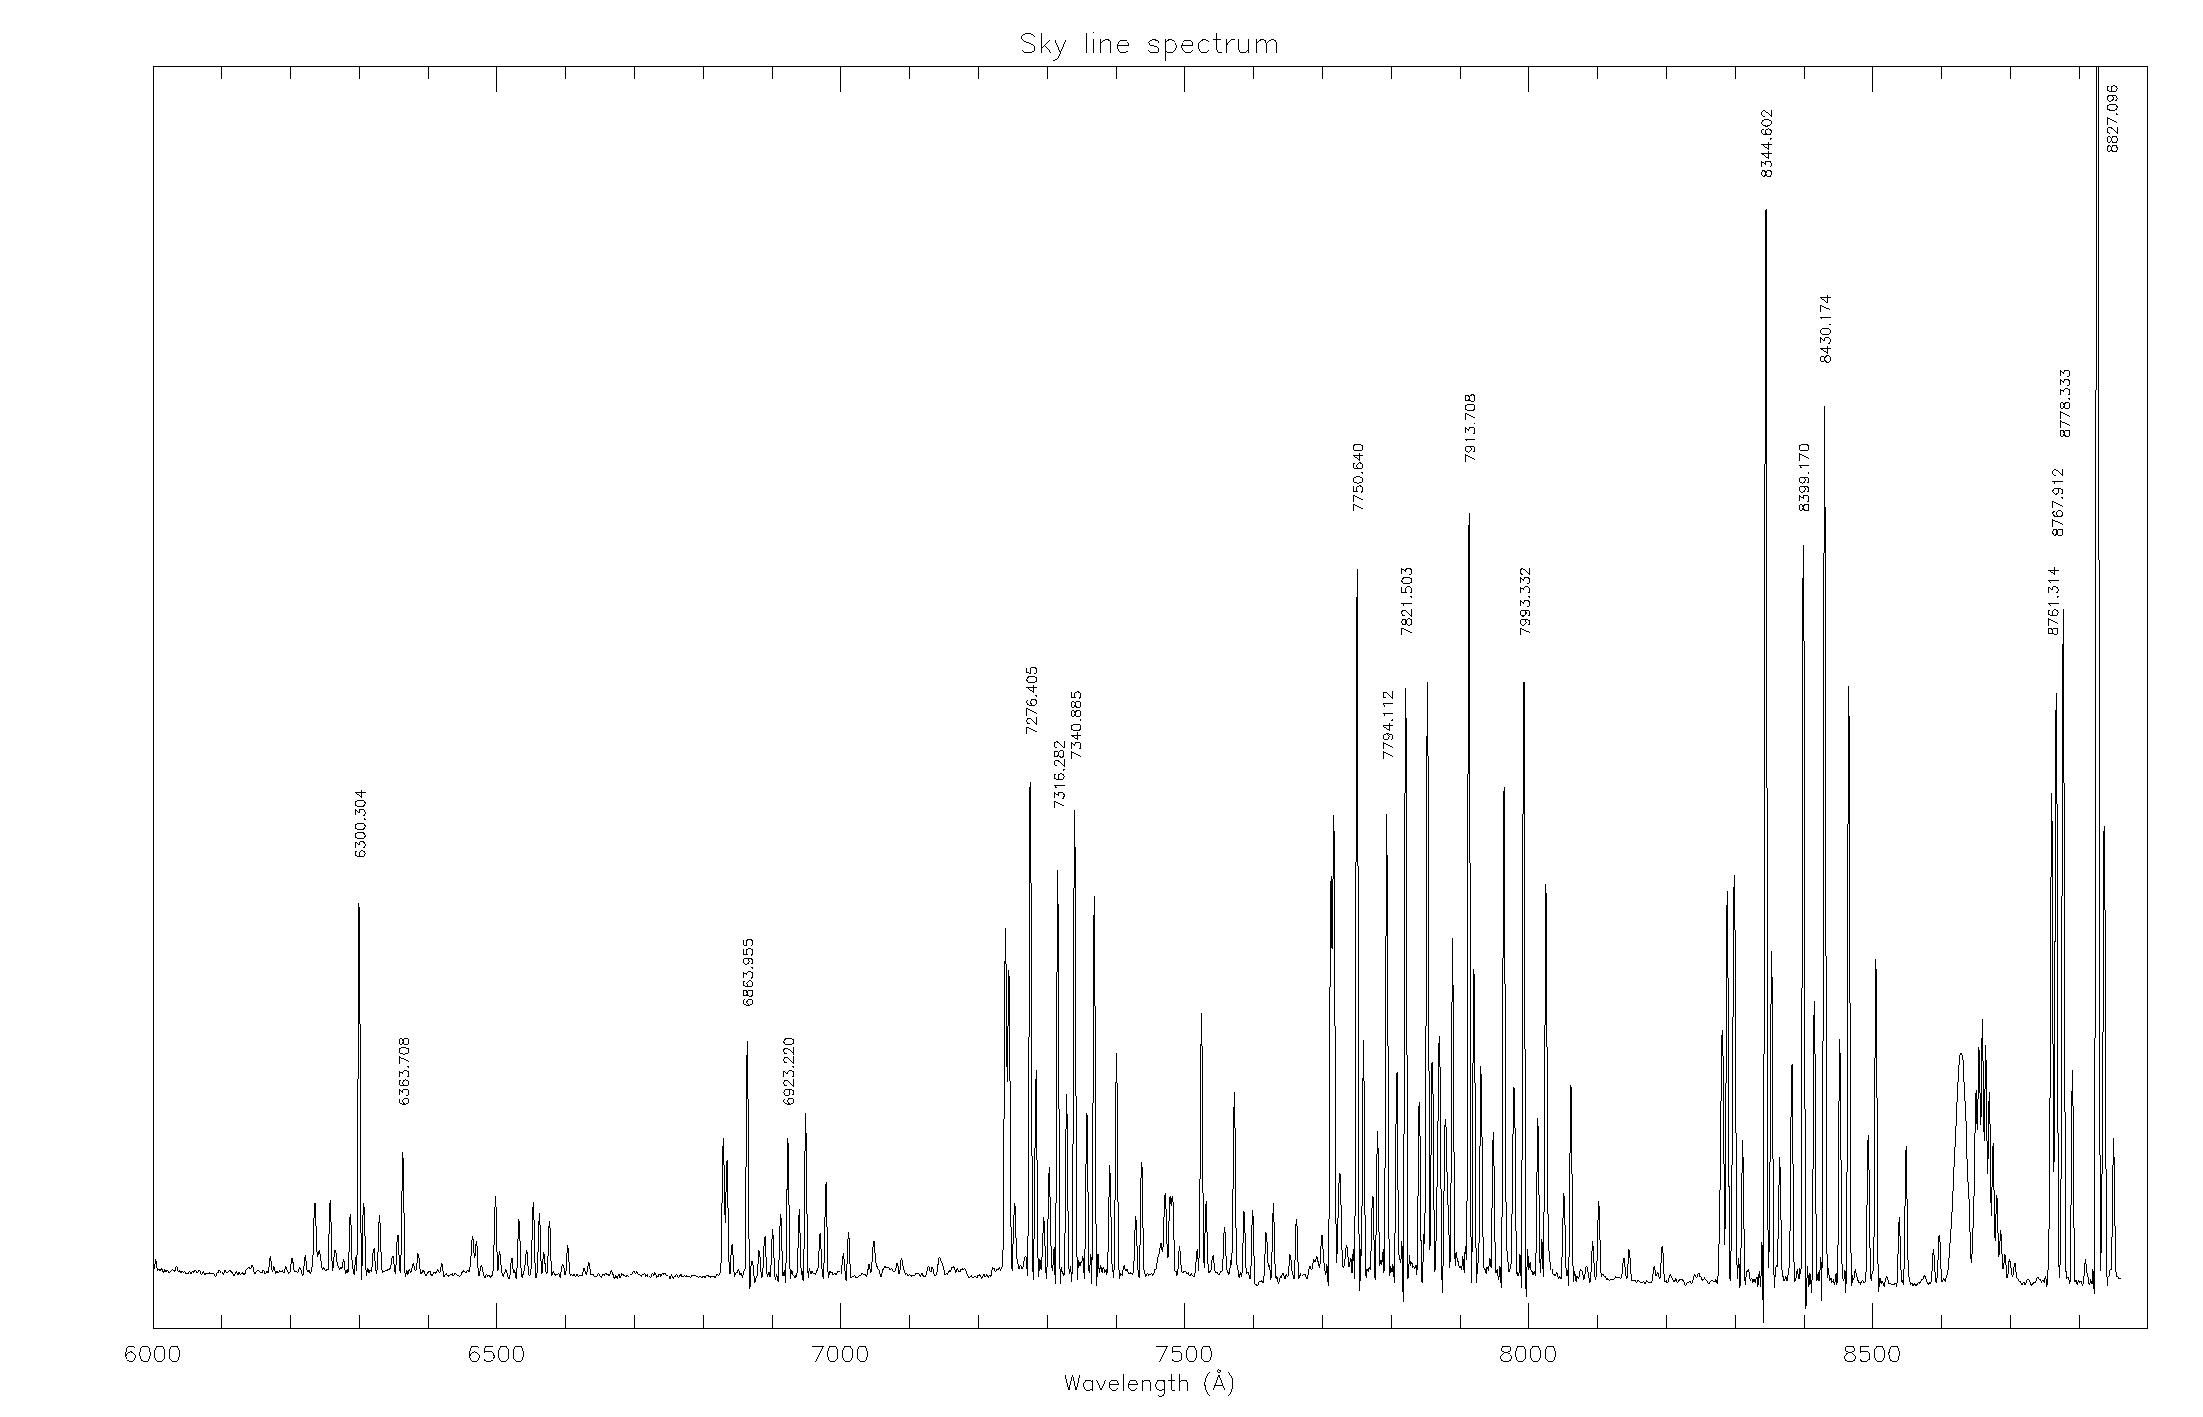 jkt's grating spectra reduction: full wavelength calibration using